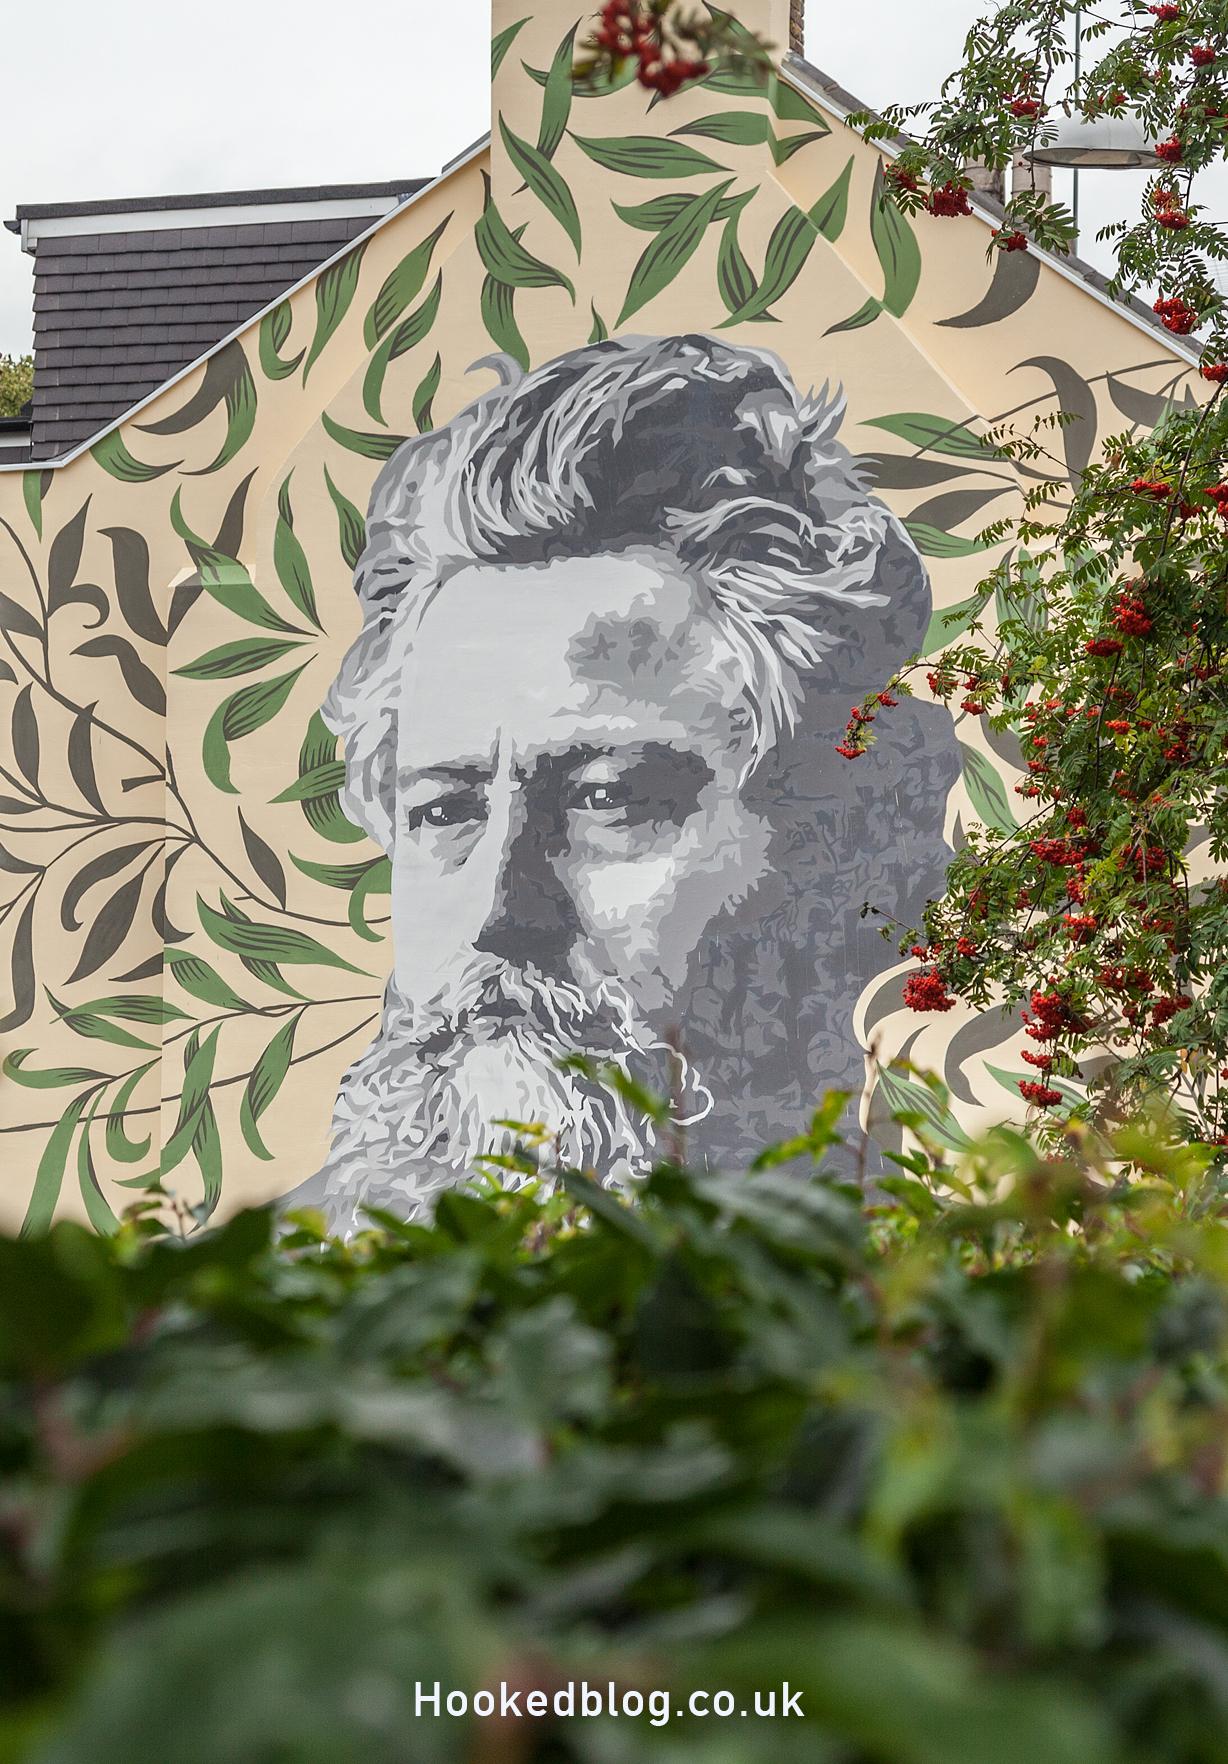 Wonderful William Morris Street Art Mural in Walthamstow, London. #streetart #murals #WilliamMorris